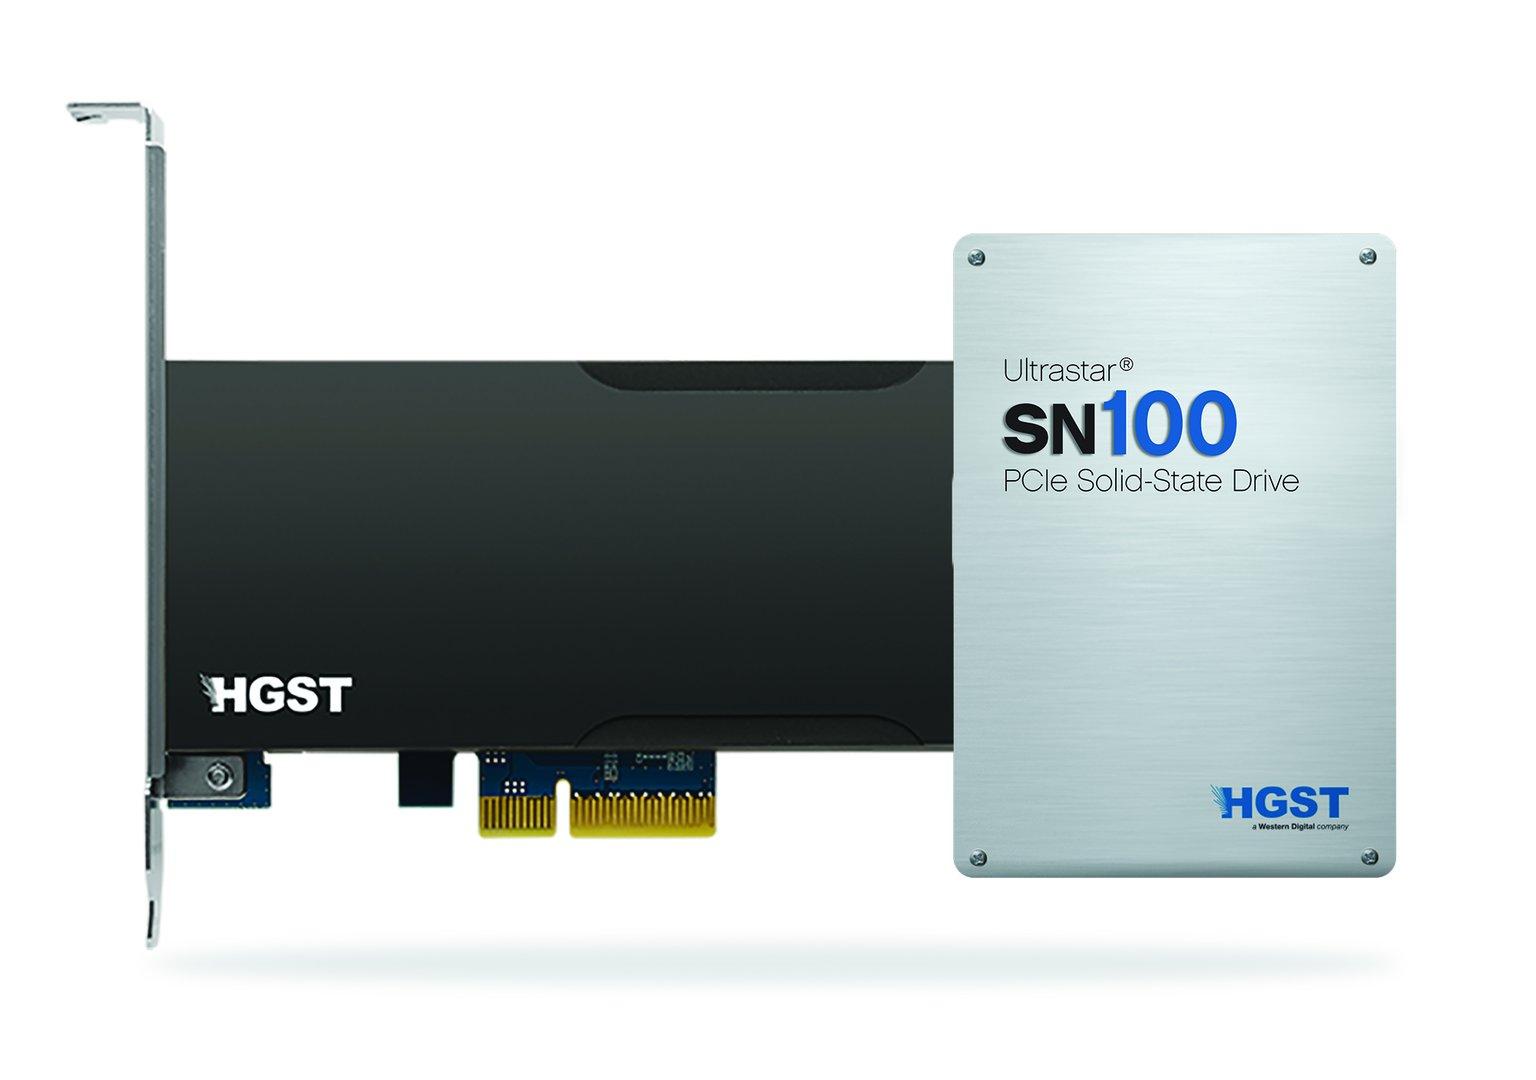 Ultrastar SN150 und SN100